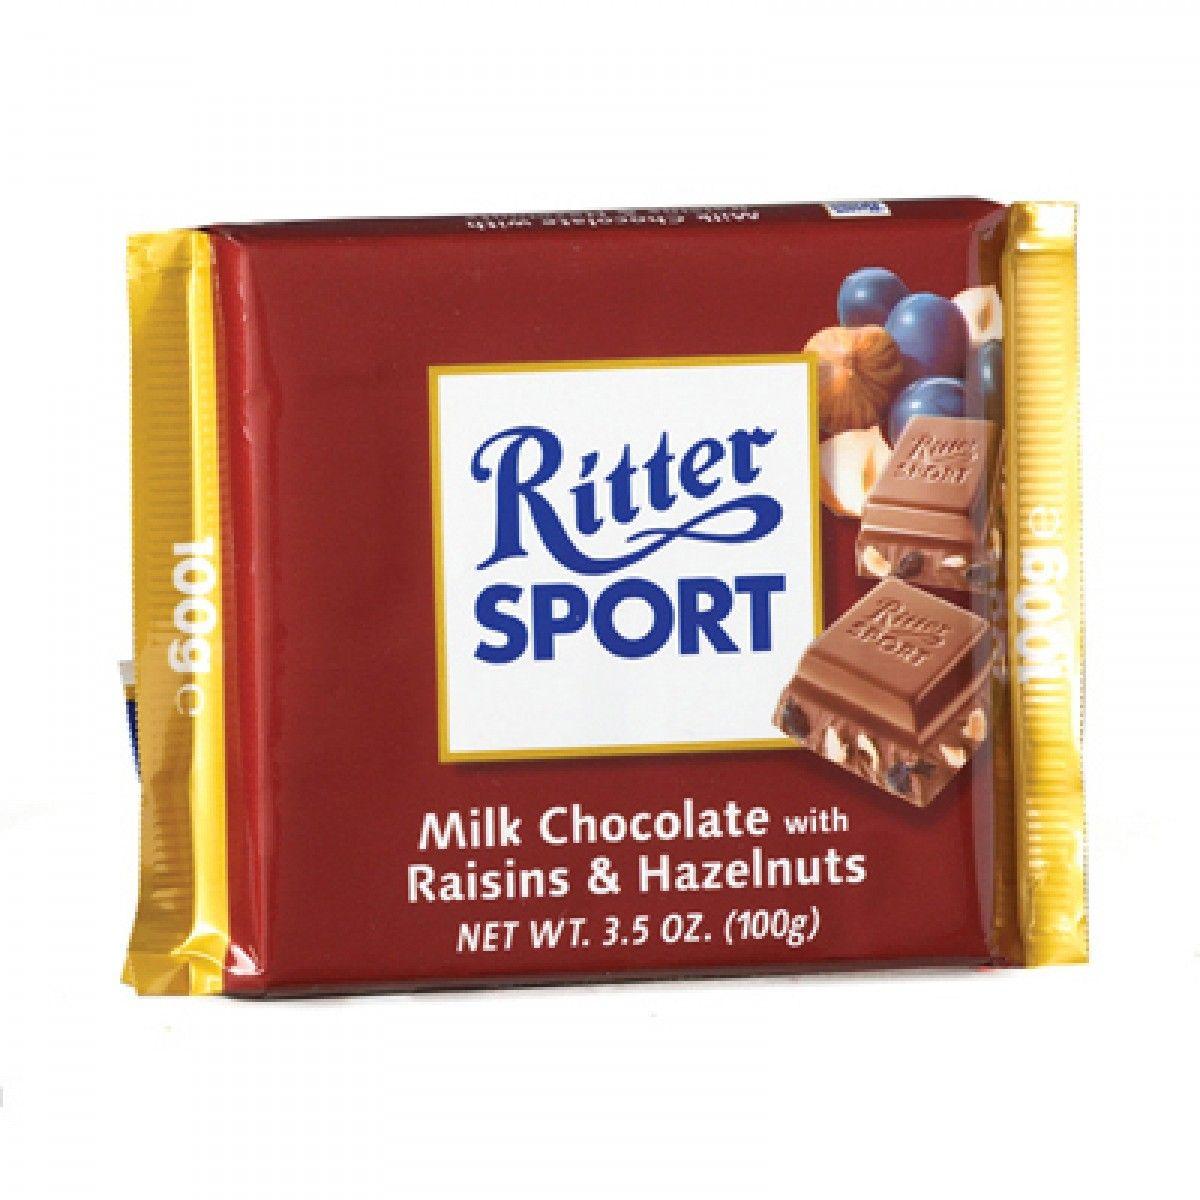 RITTER SPORT Milk Chocolate w/ Raisins & Hazelnuts Bar